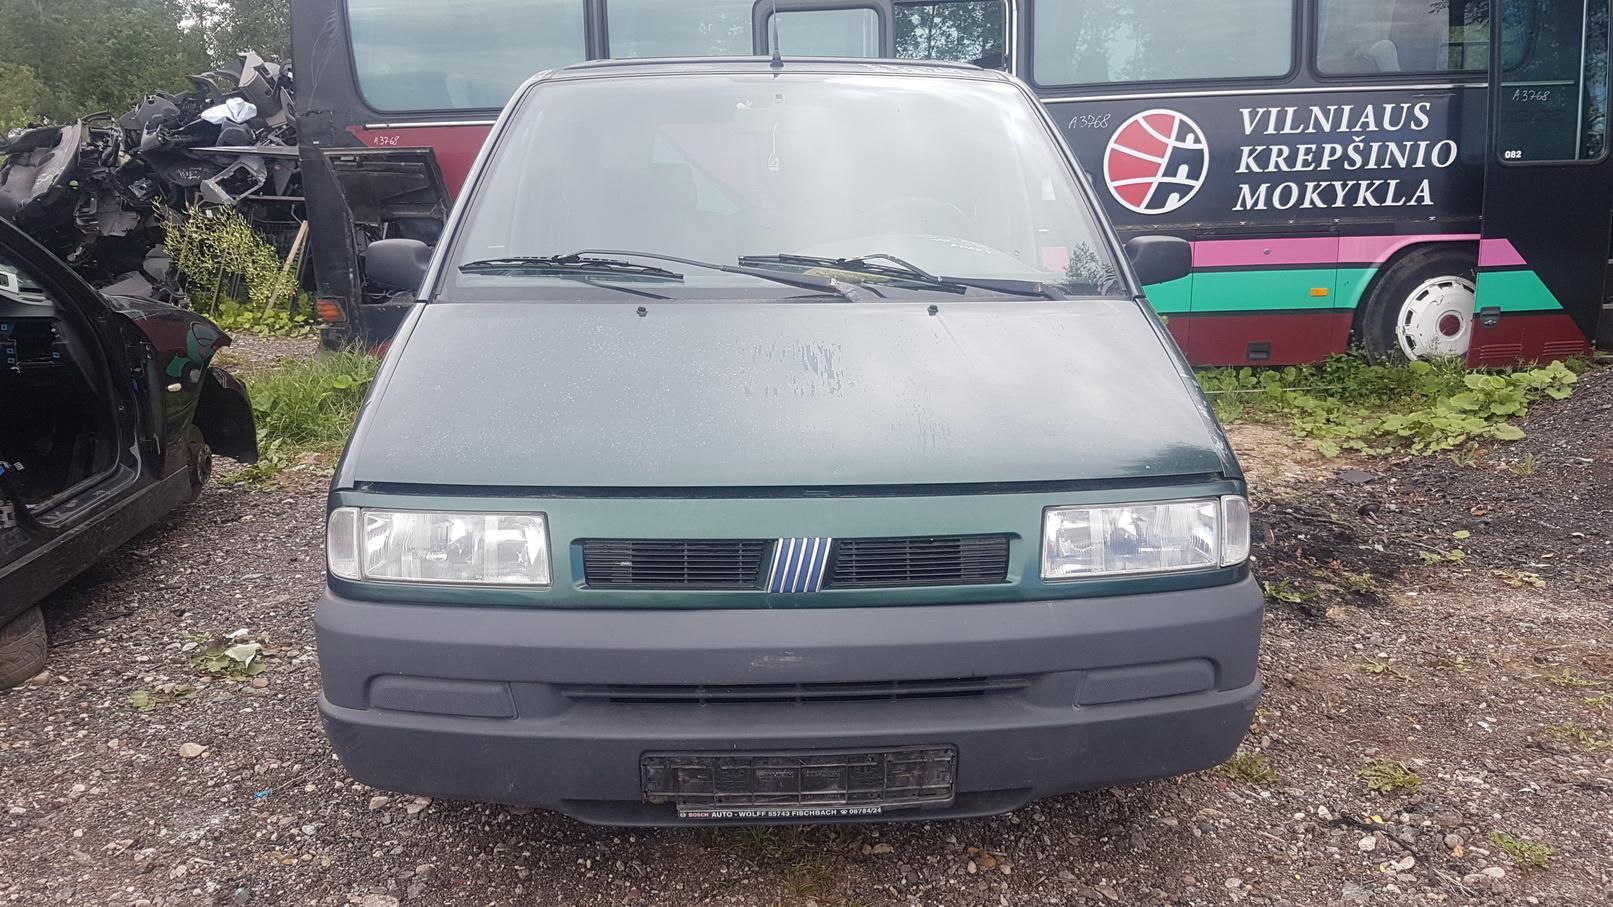 Lhd Used Steering Column Fiat Ulysse 1994 20l 60eur Eis00474828 Fuse Box In Foto 2 2002 Petrol 20